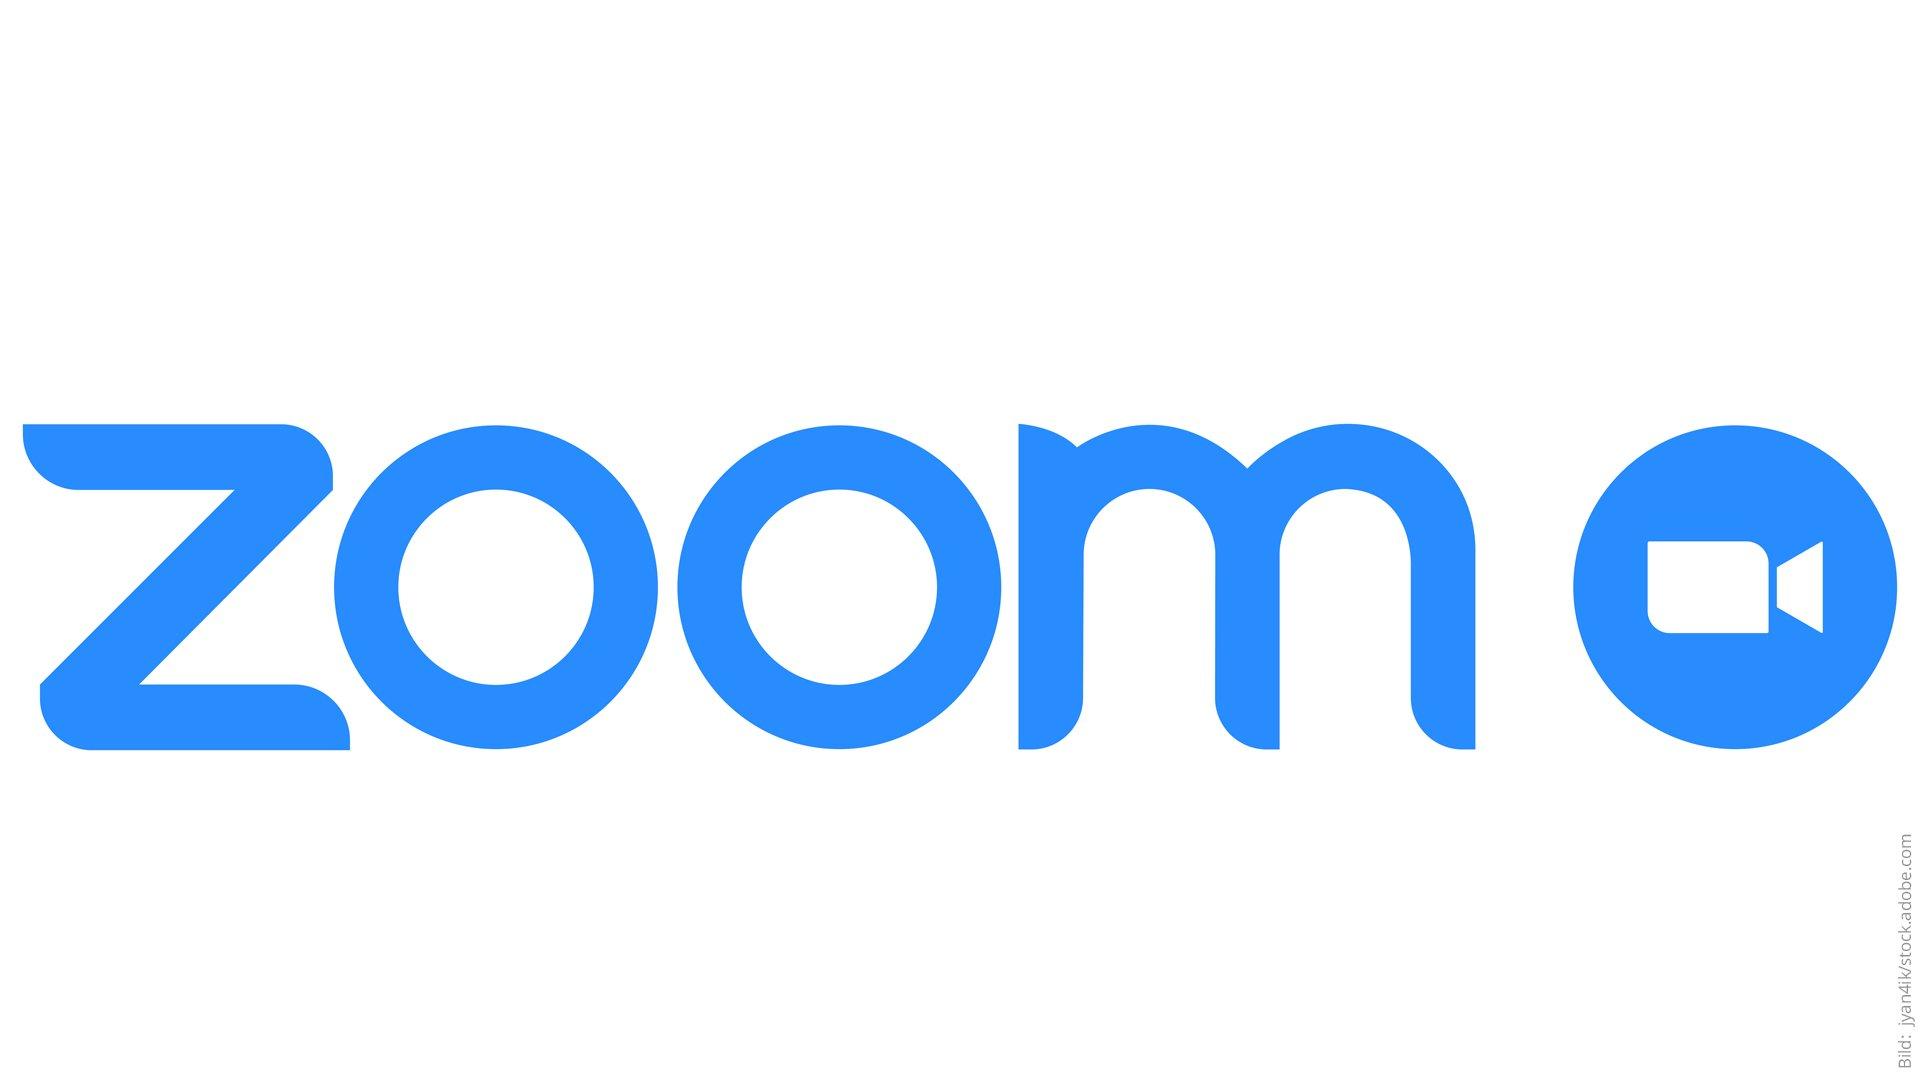 Wie funktioniert Zoom? Zoom Schriftzug.